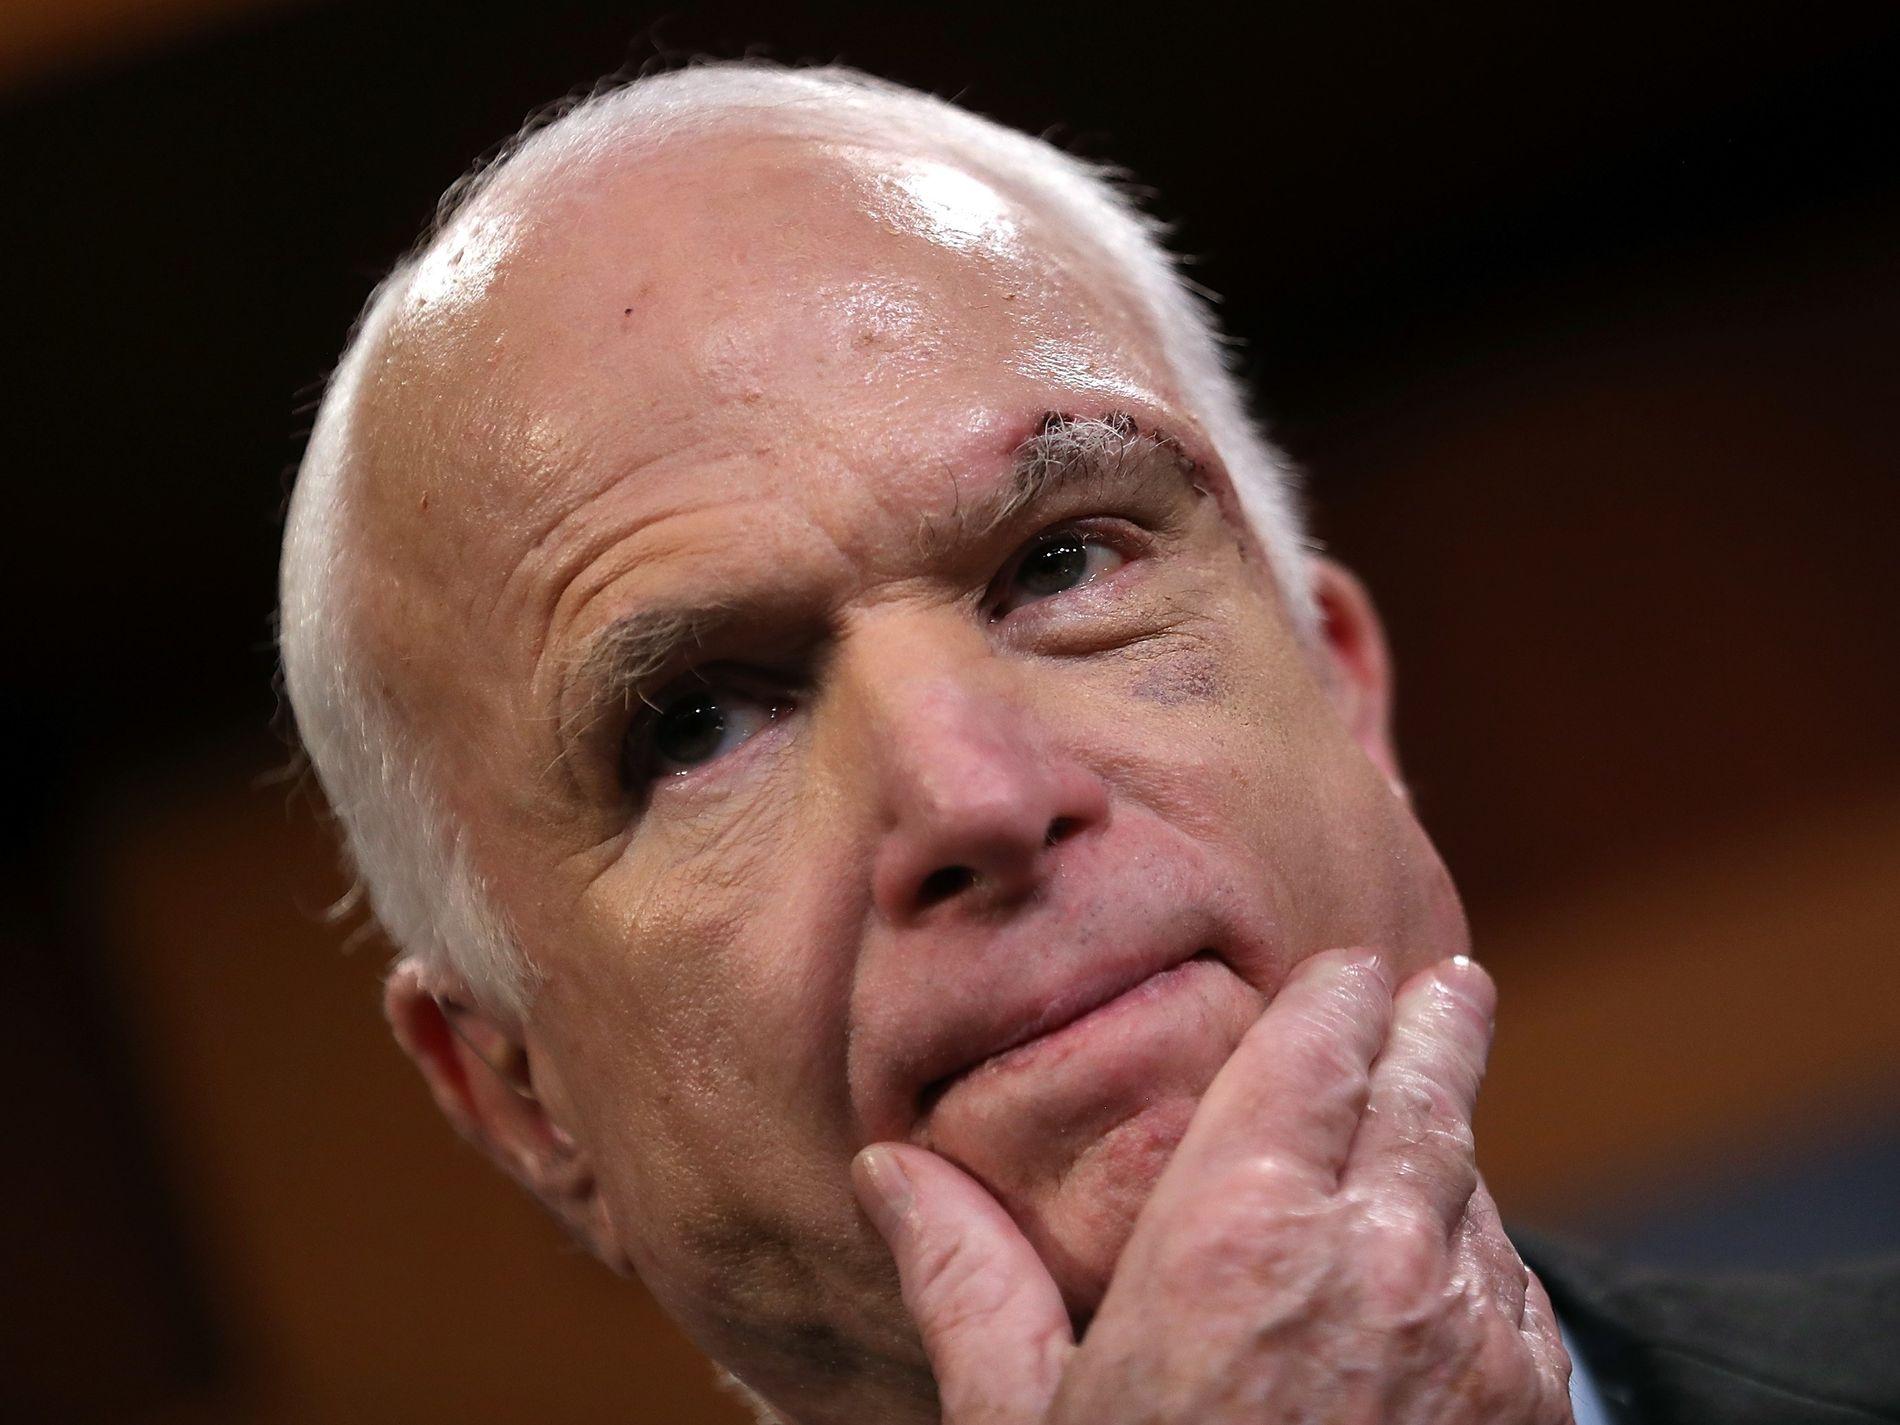 SENATOR: John McCain har representert Arizona i over 30 år i Kongressen i Washington, D.C.